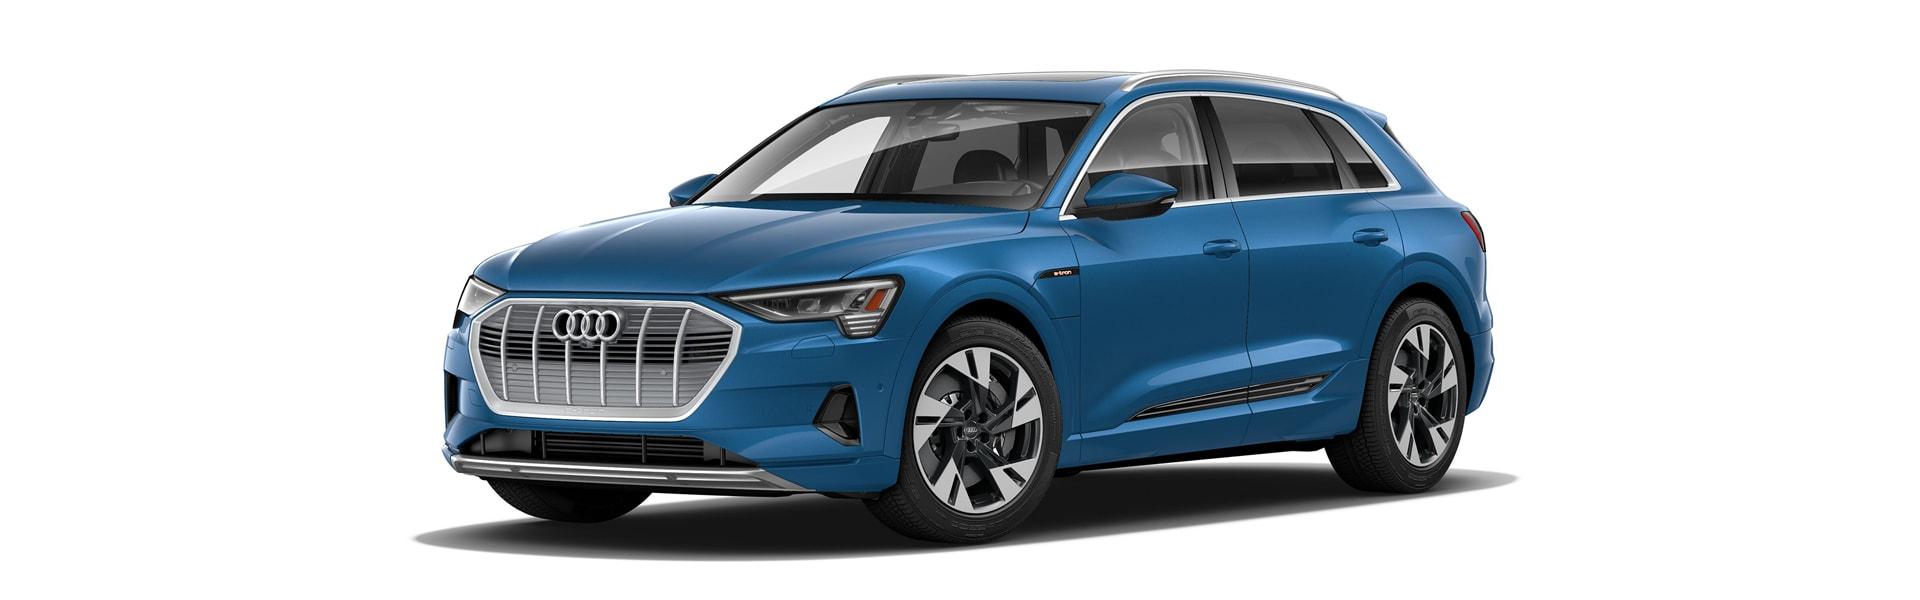 100% Electric, 100% Audi